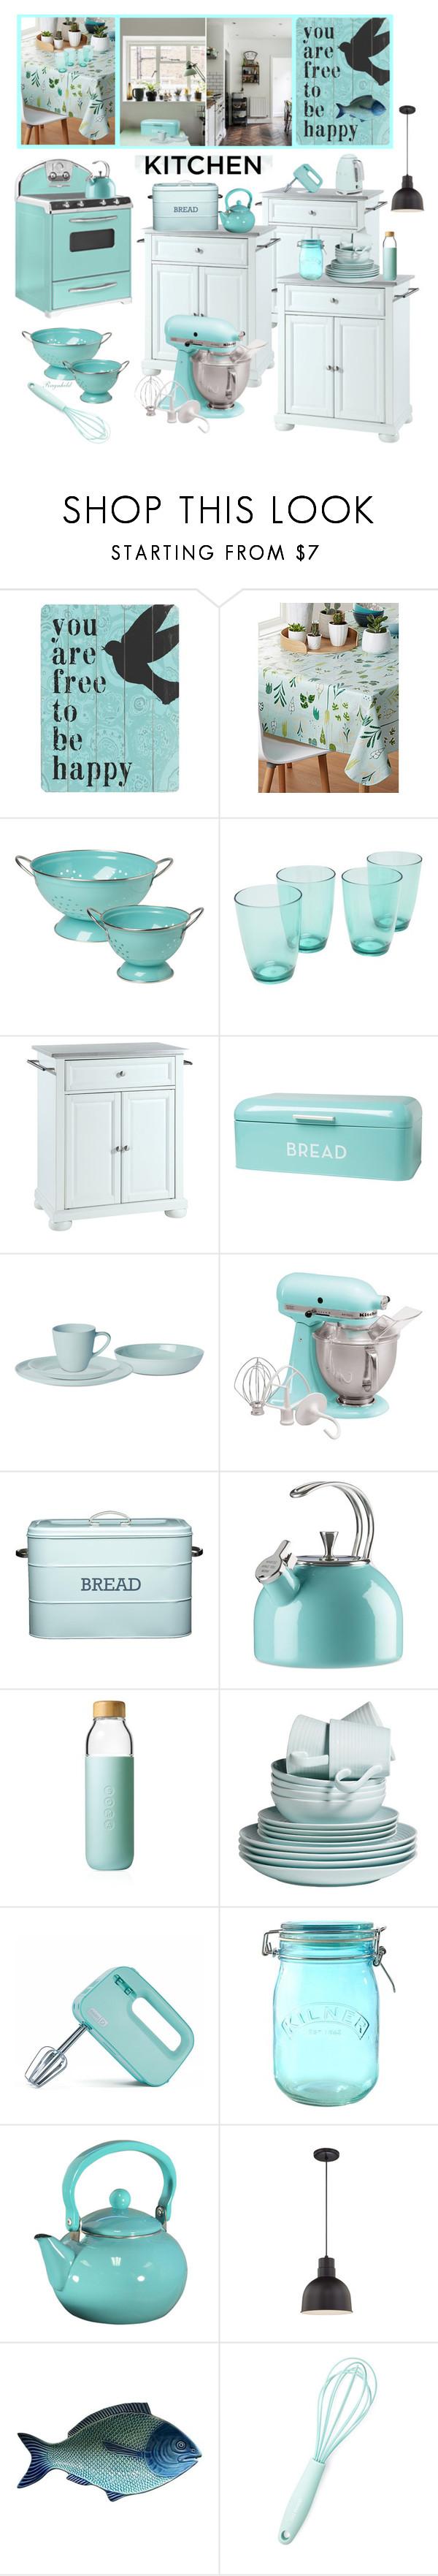 Dream Kitchen Design, Interior decorating, Cool rooms